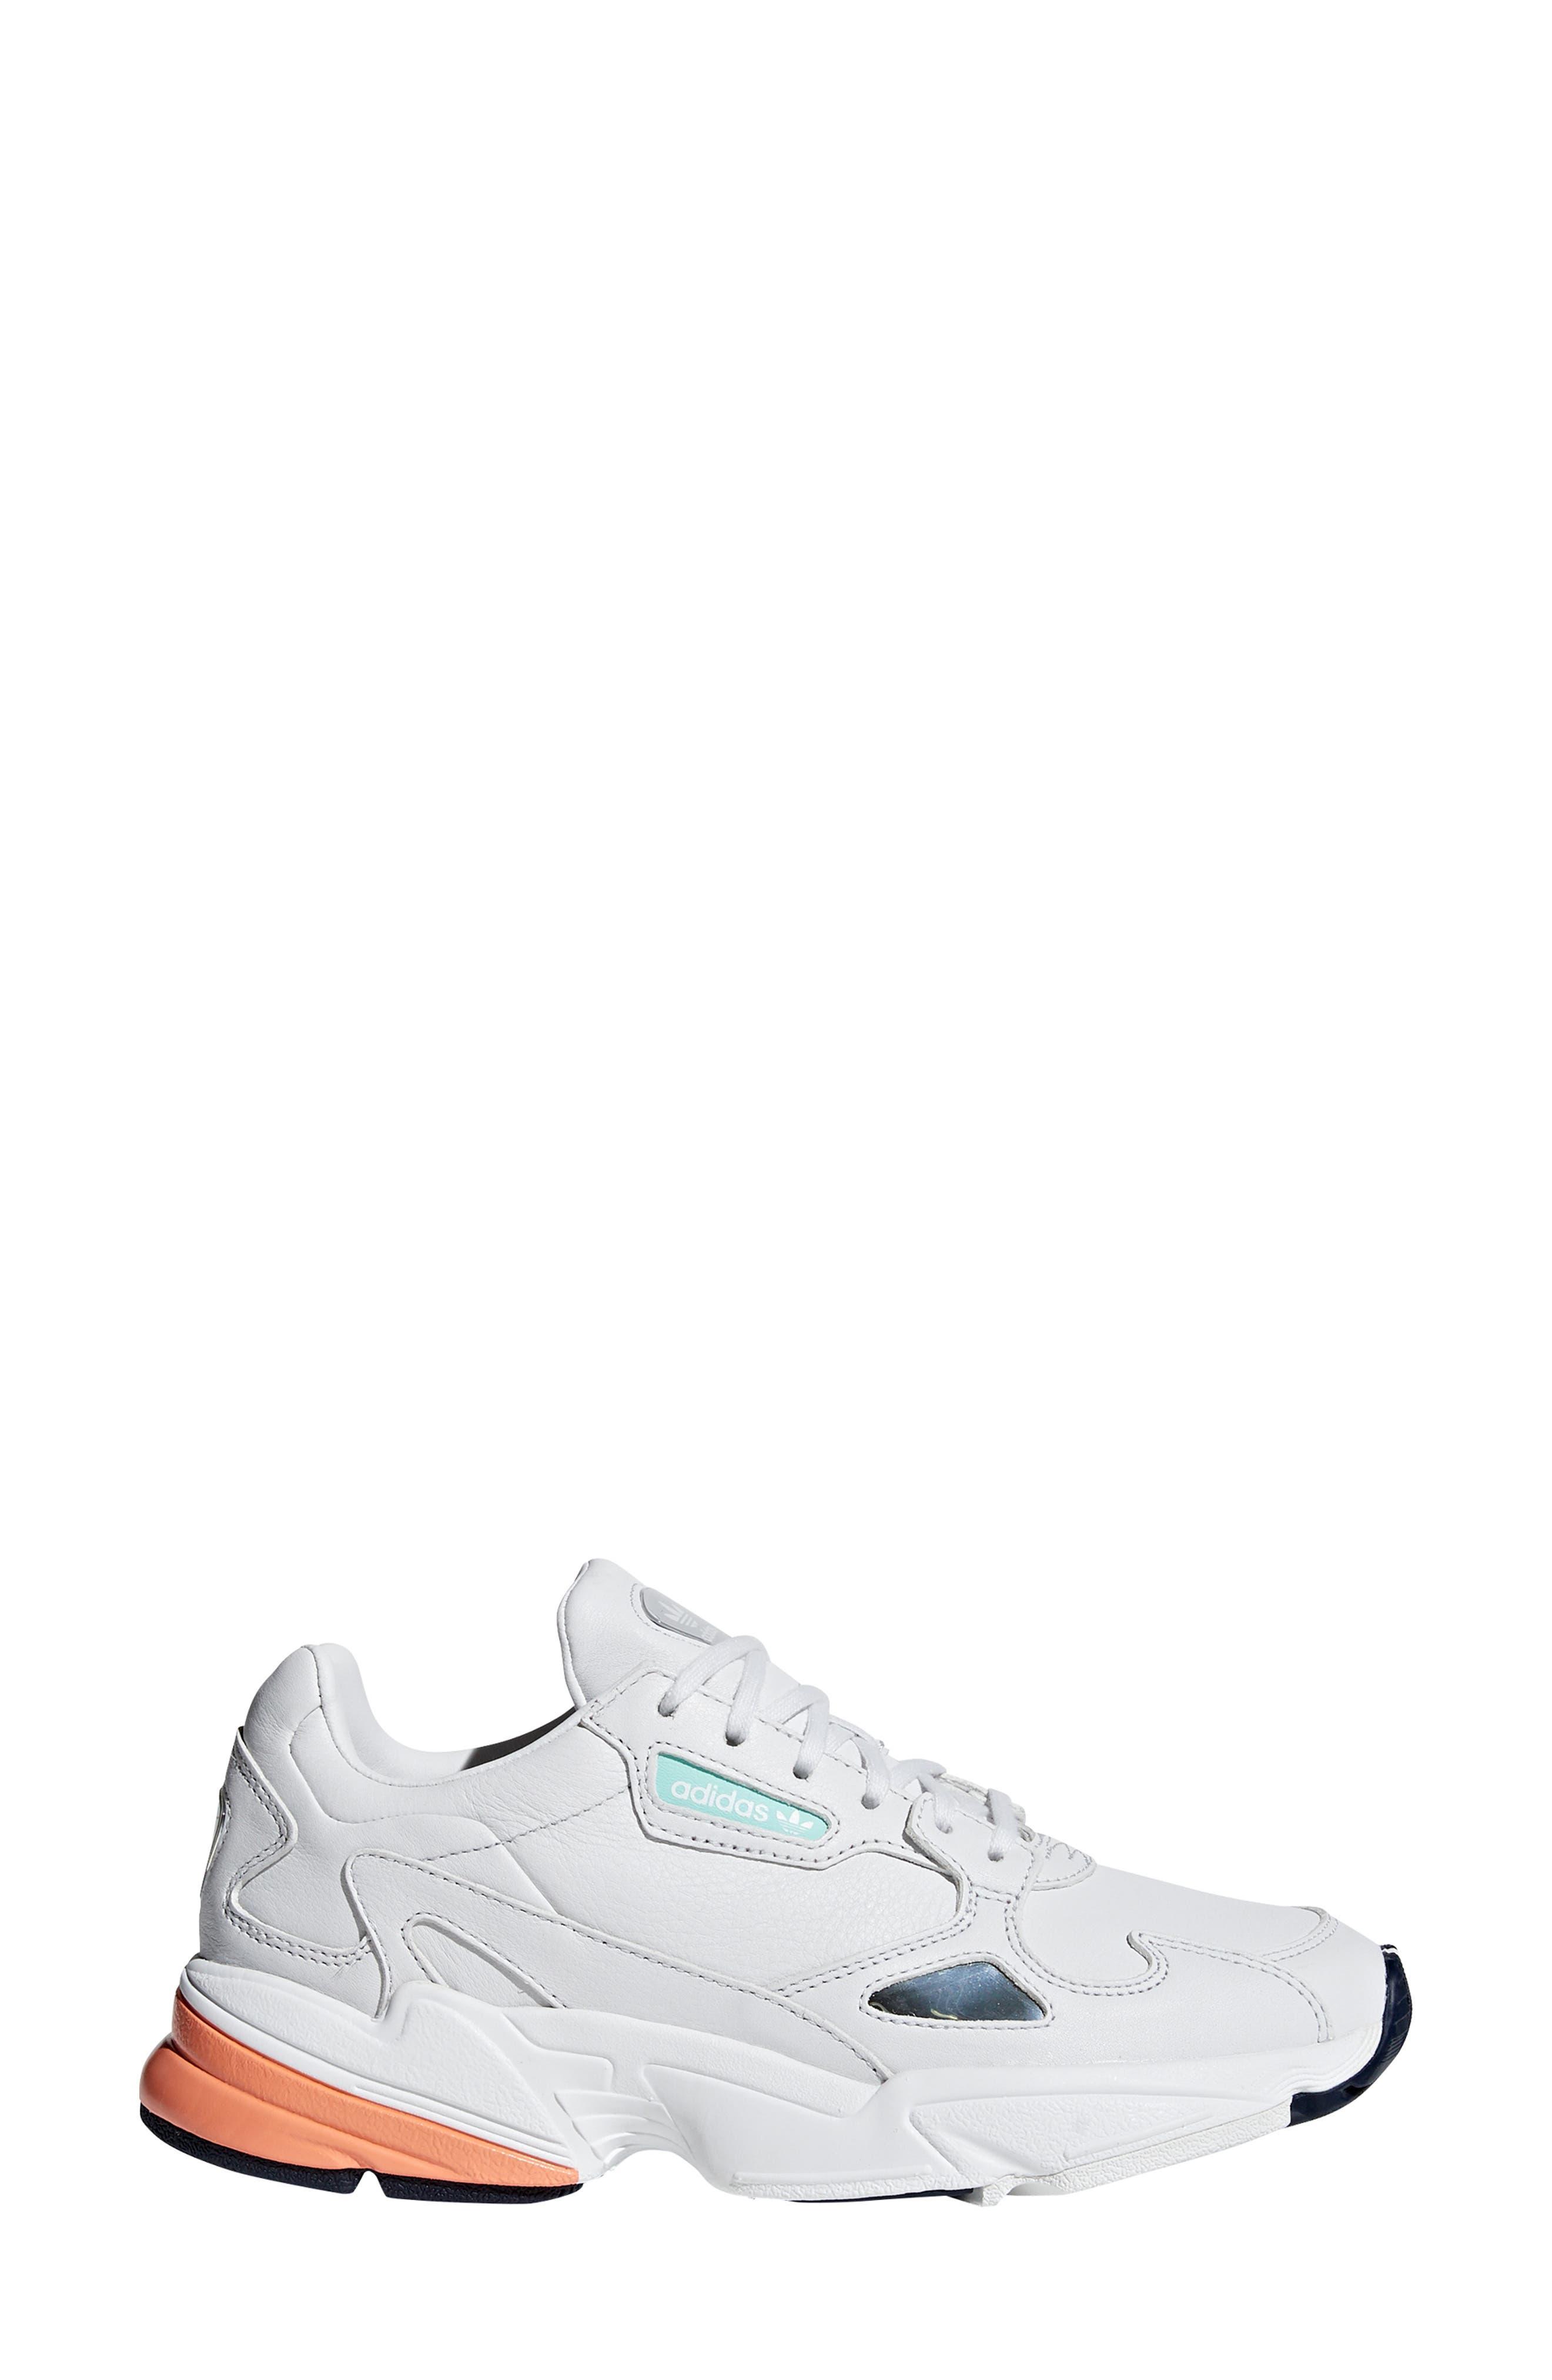 Falcon Sneaker,                             Alternate thumbnail 3, color,                             CRYSTAL WHITE/ EASY ORANGE